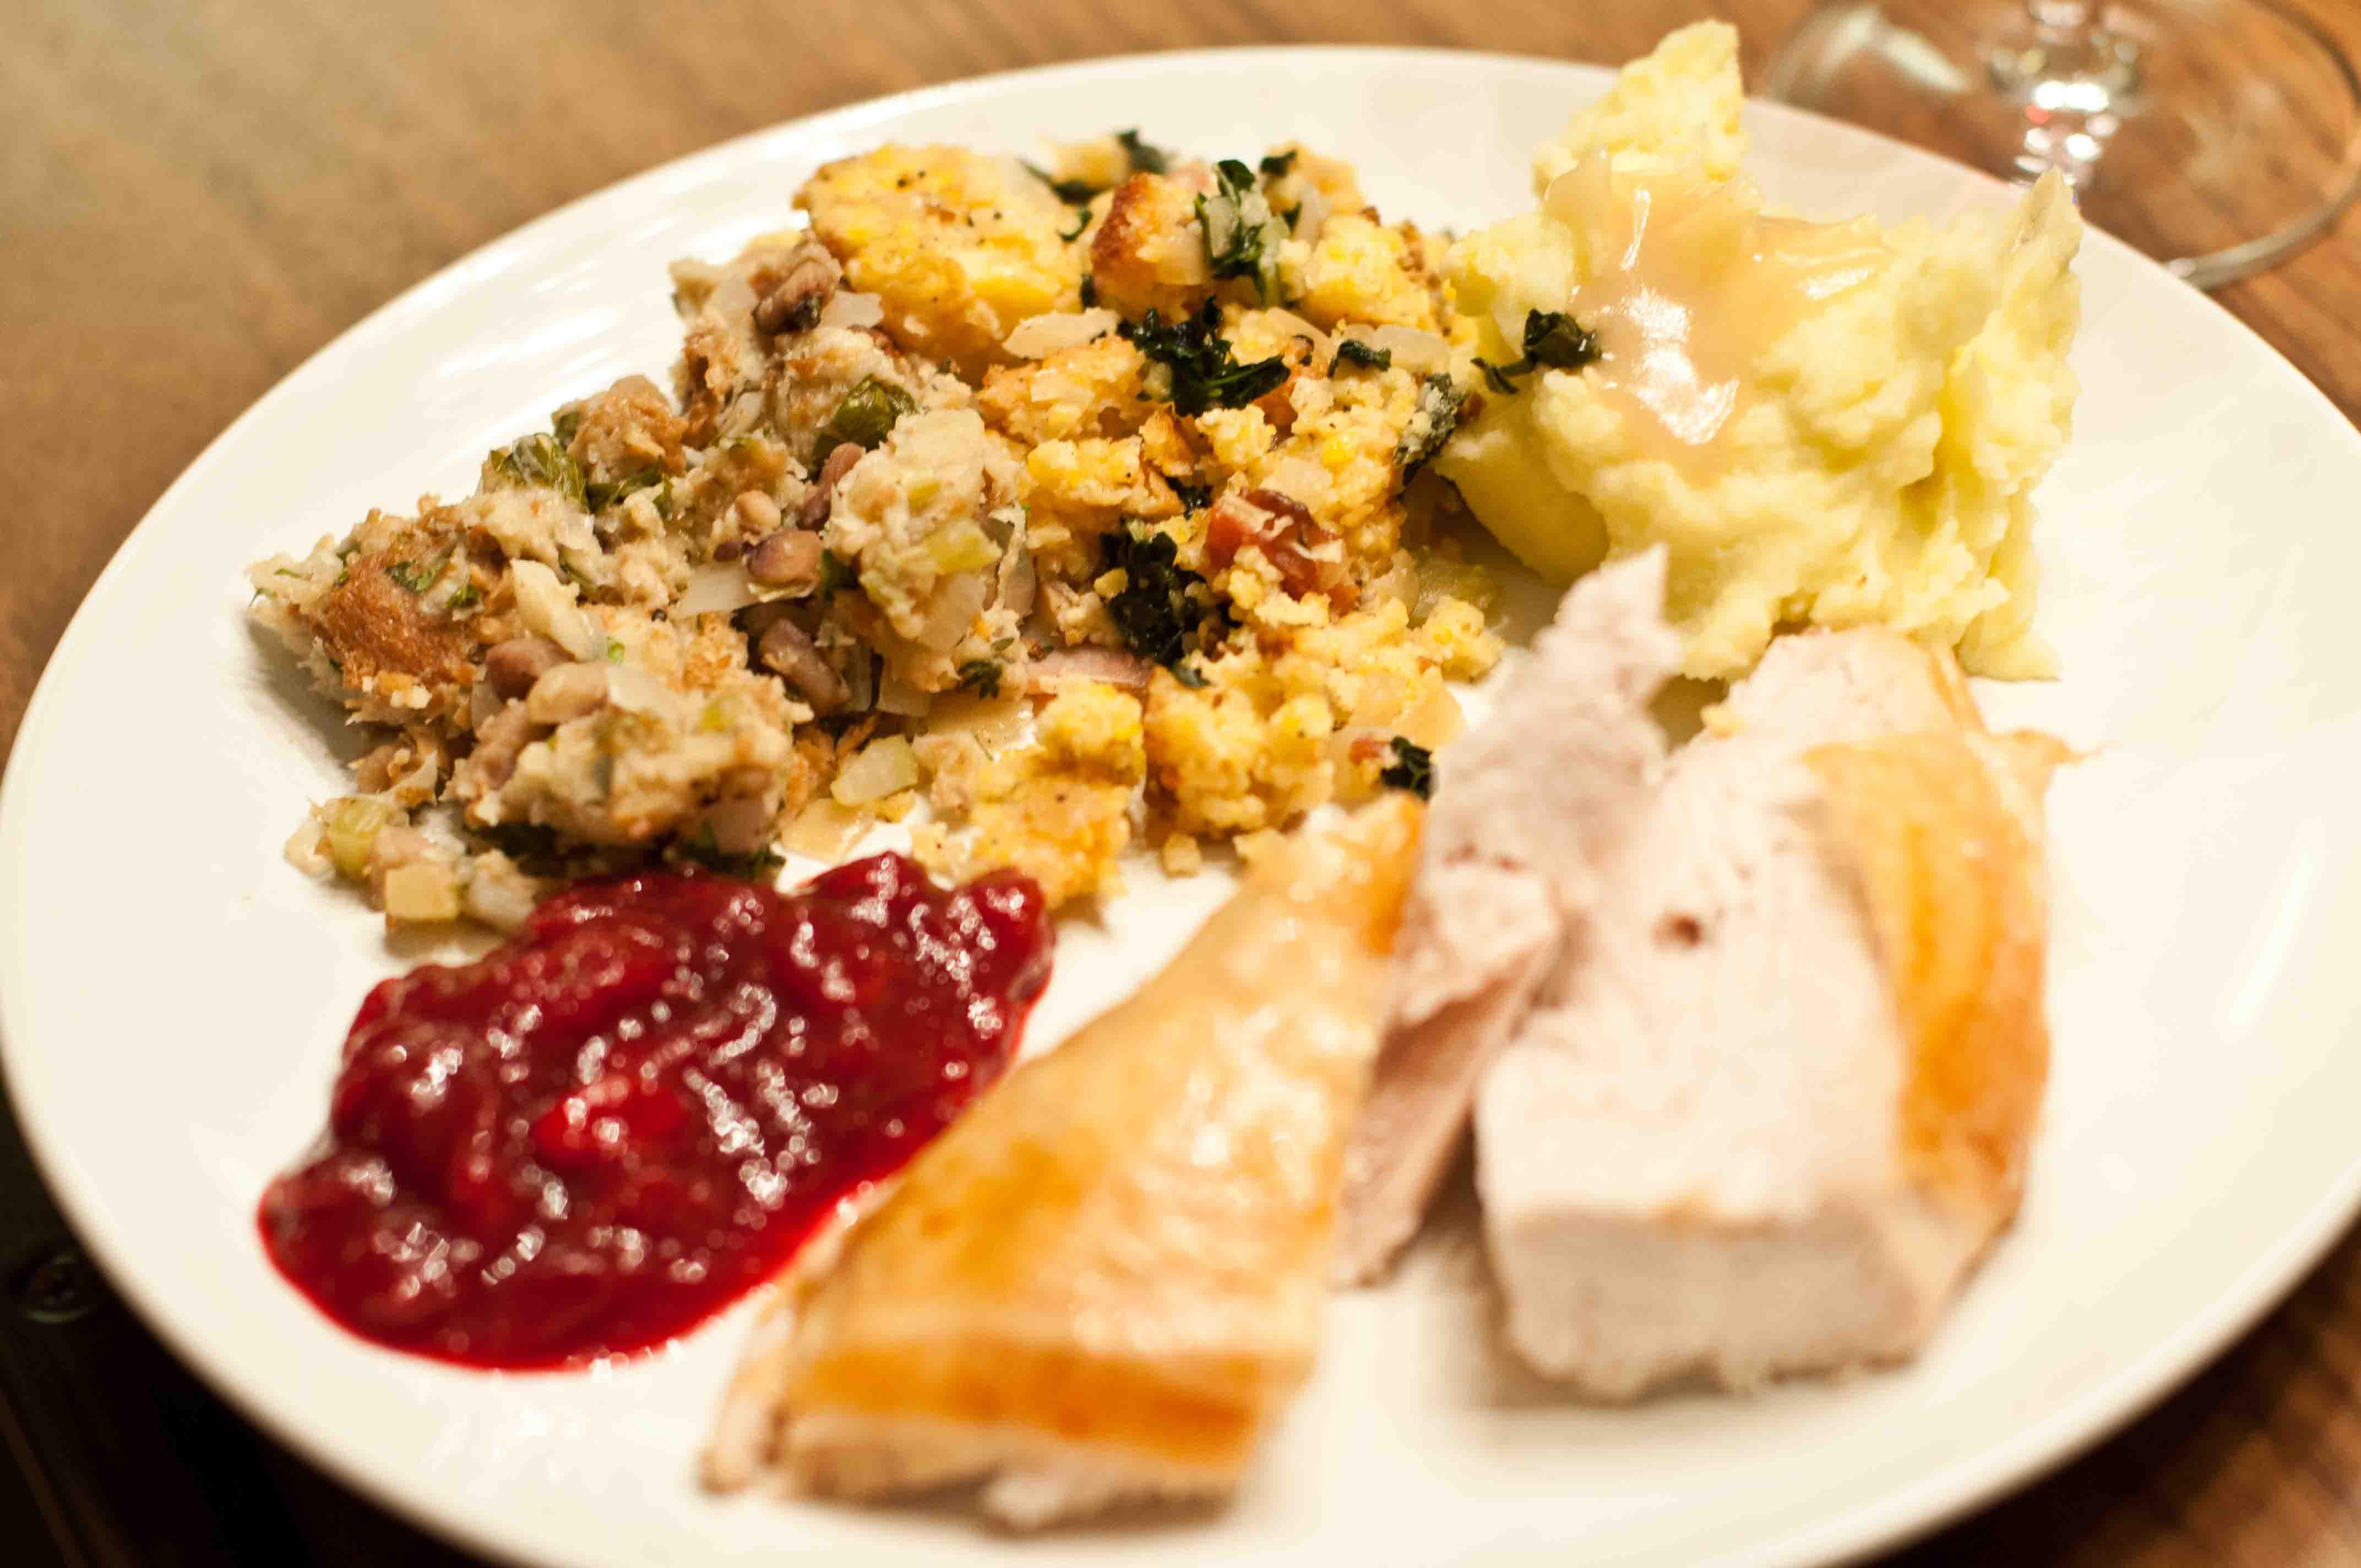 Thanksgiving Dinner Plate  Thanksgiving Dinner Plate & Homemade Turkey Thanksgiving